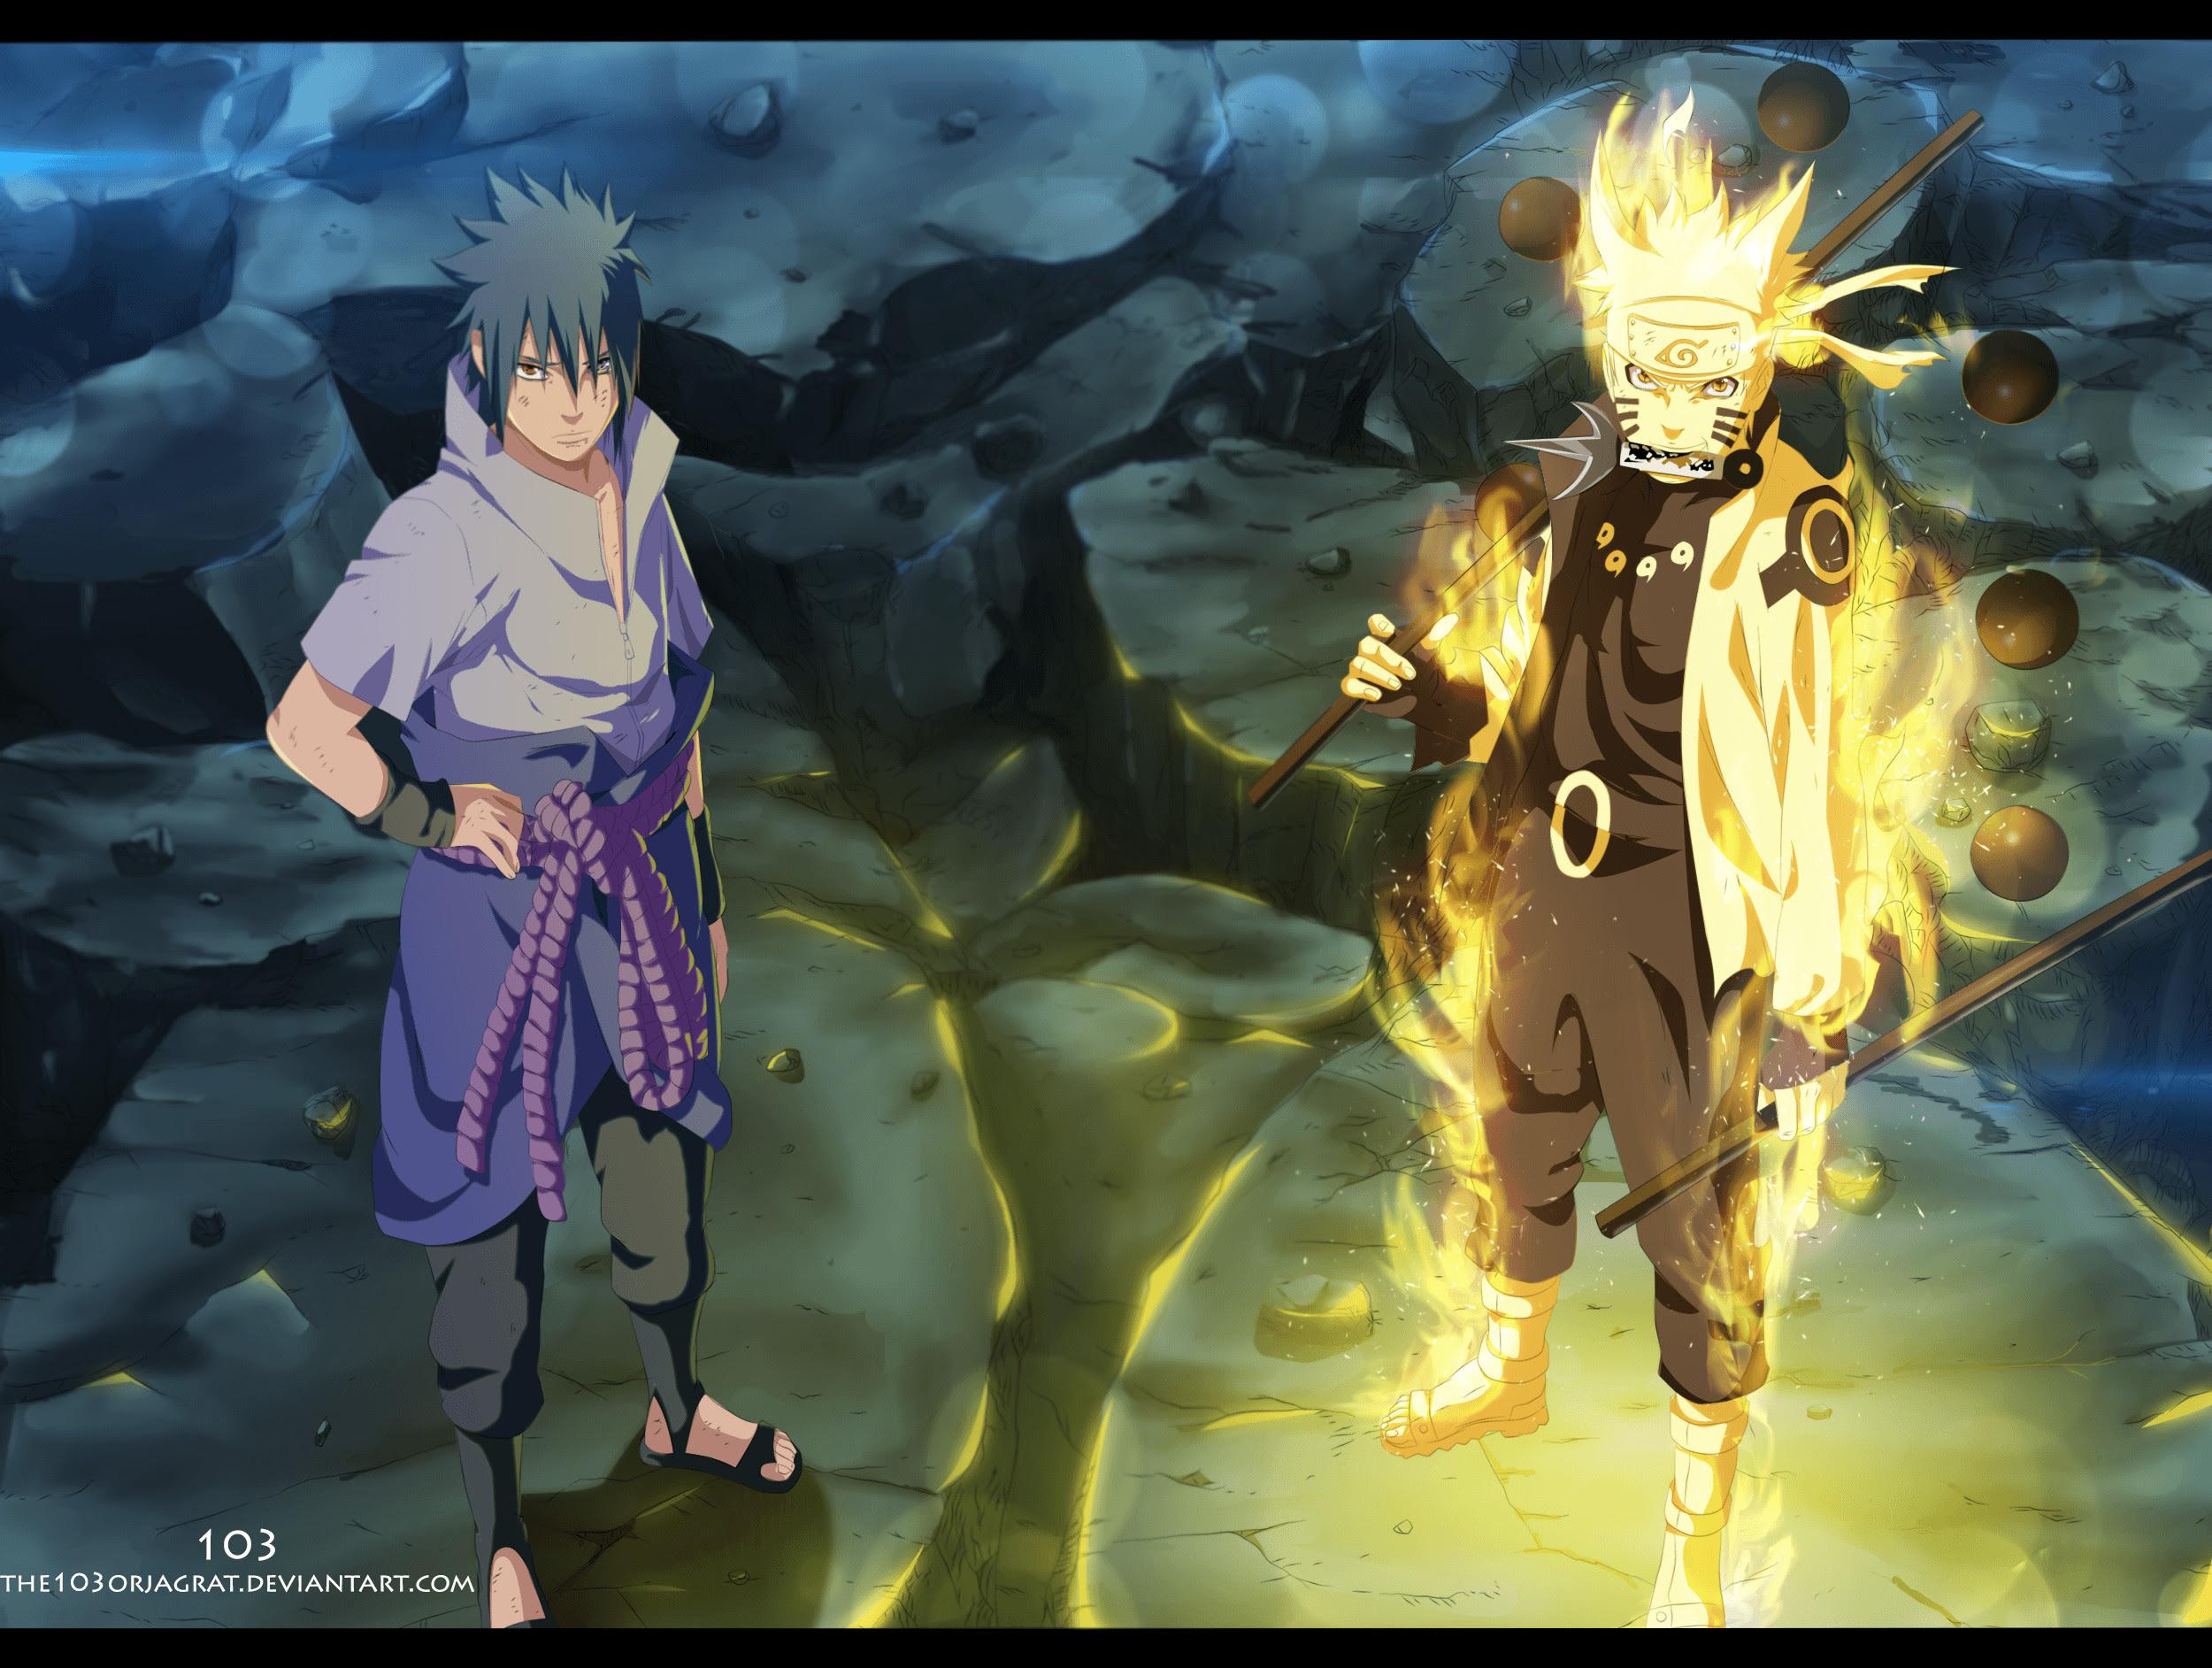 Download 740 Koleksi Wallpaper Naruto Sasuke HD Gratid